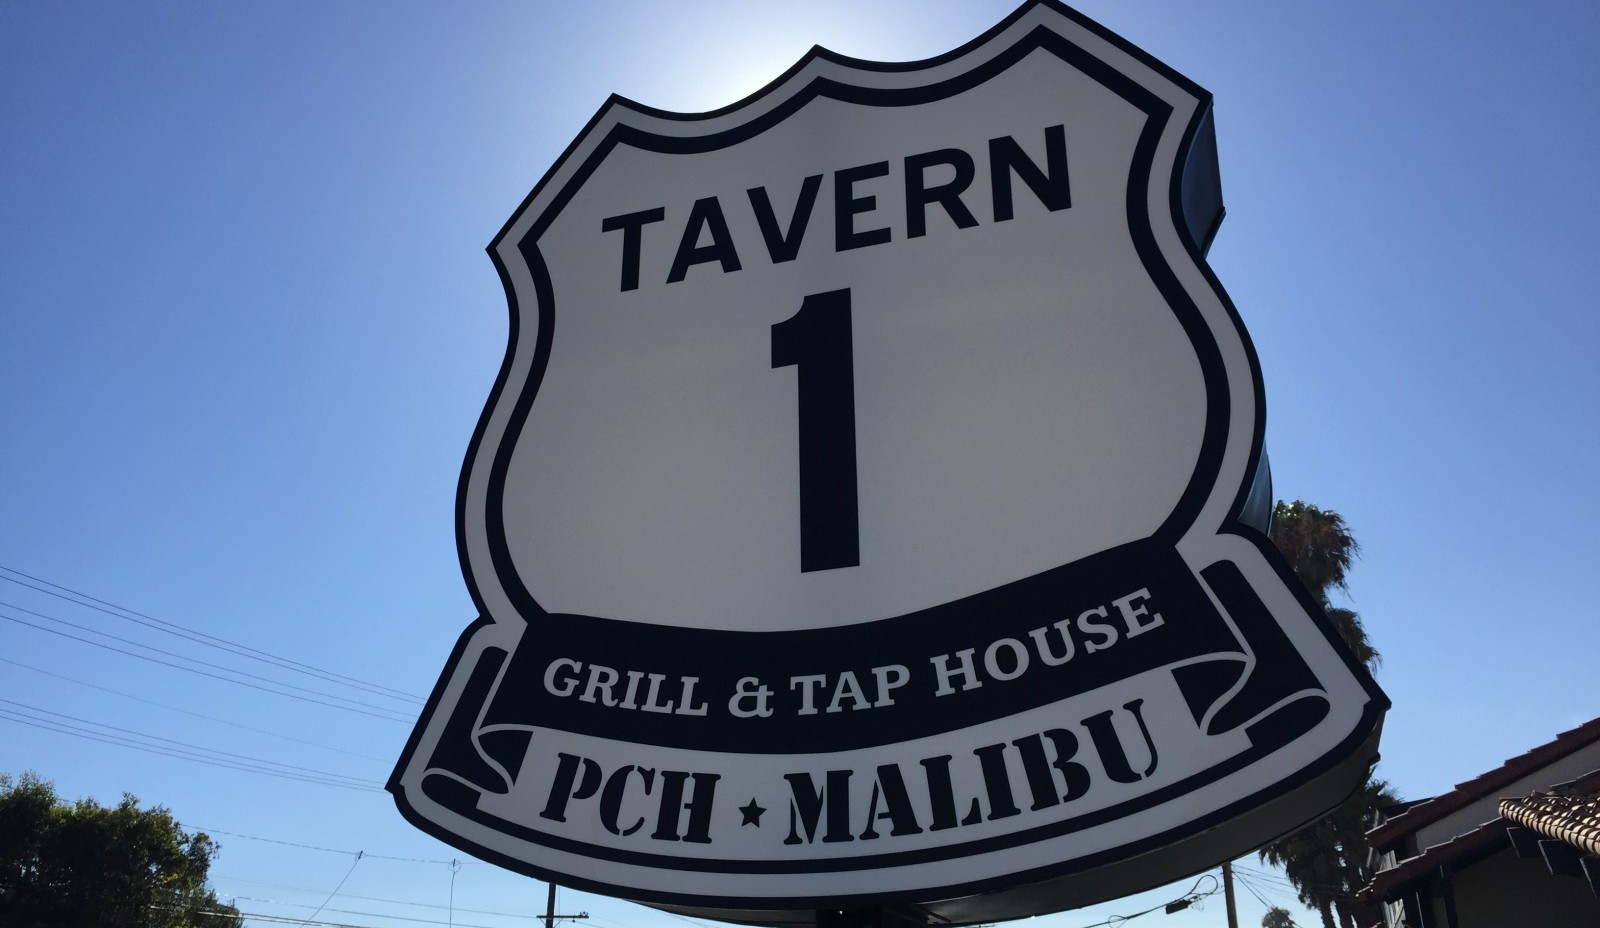 tavern1-grill-tap-house_all-things-malibu_restaurant